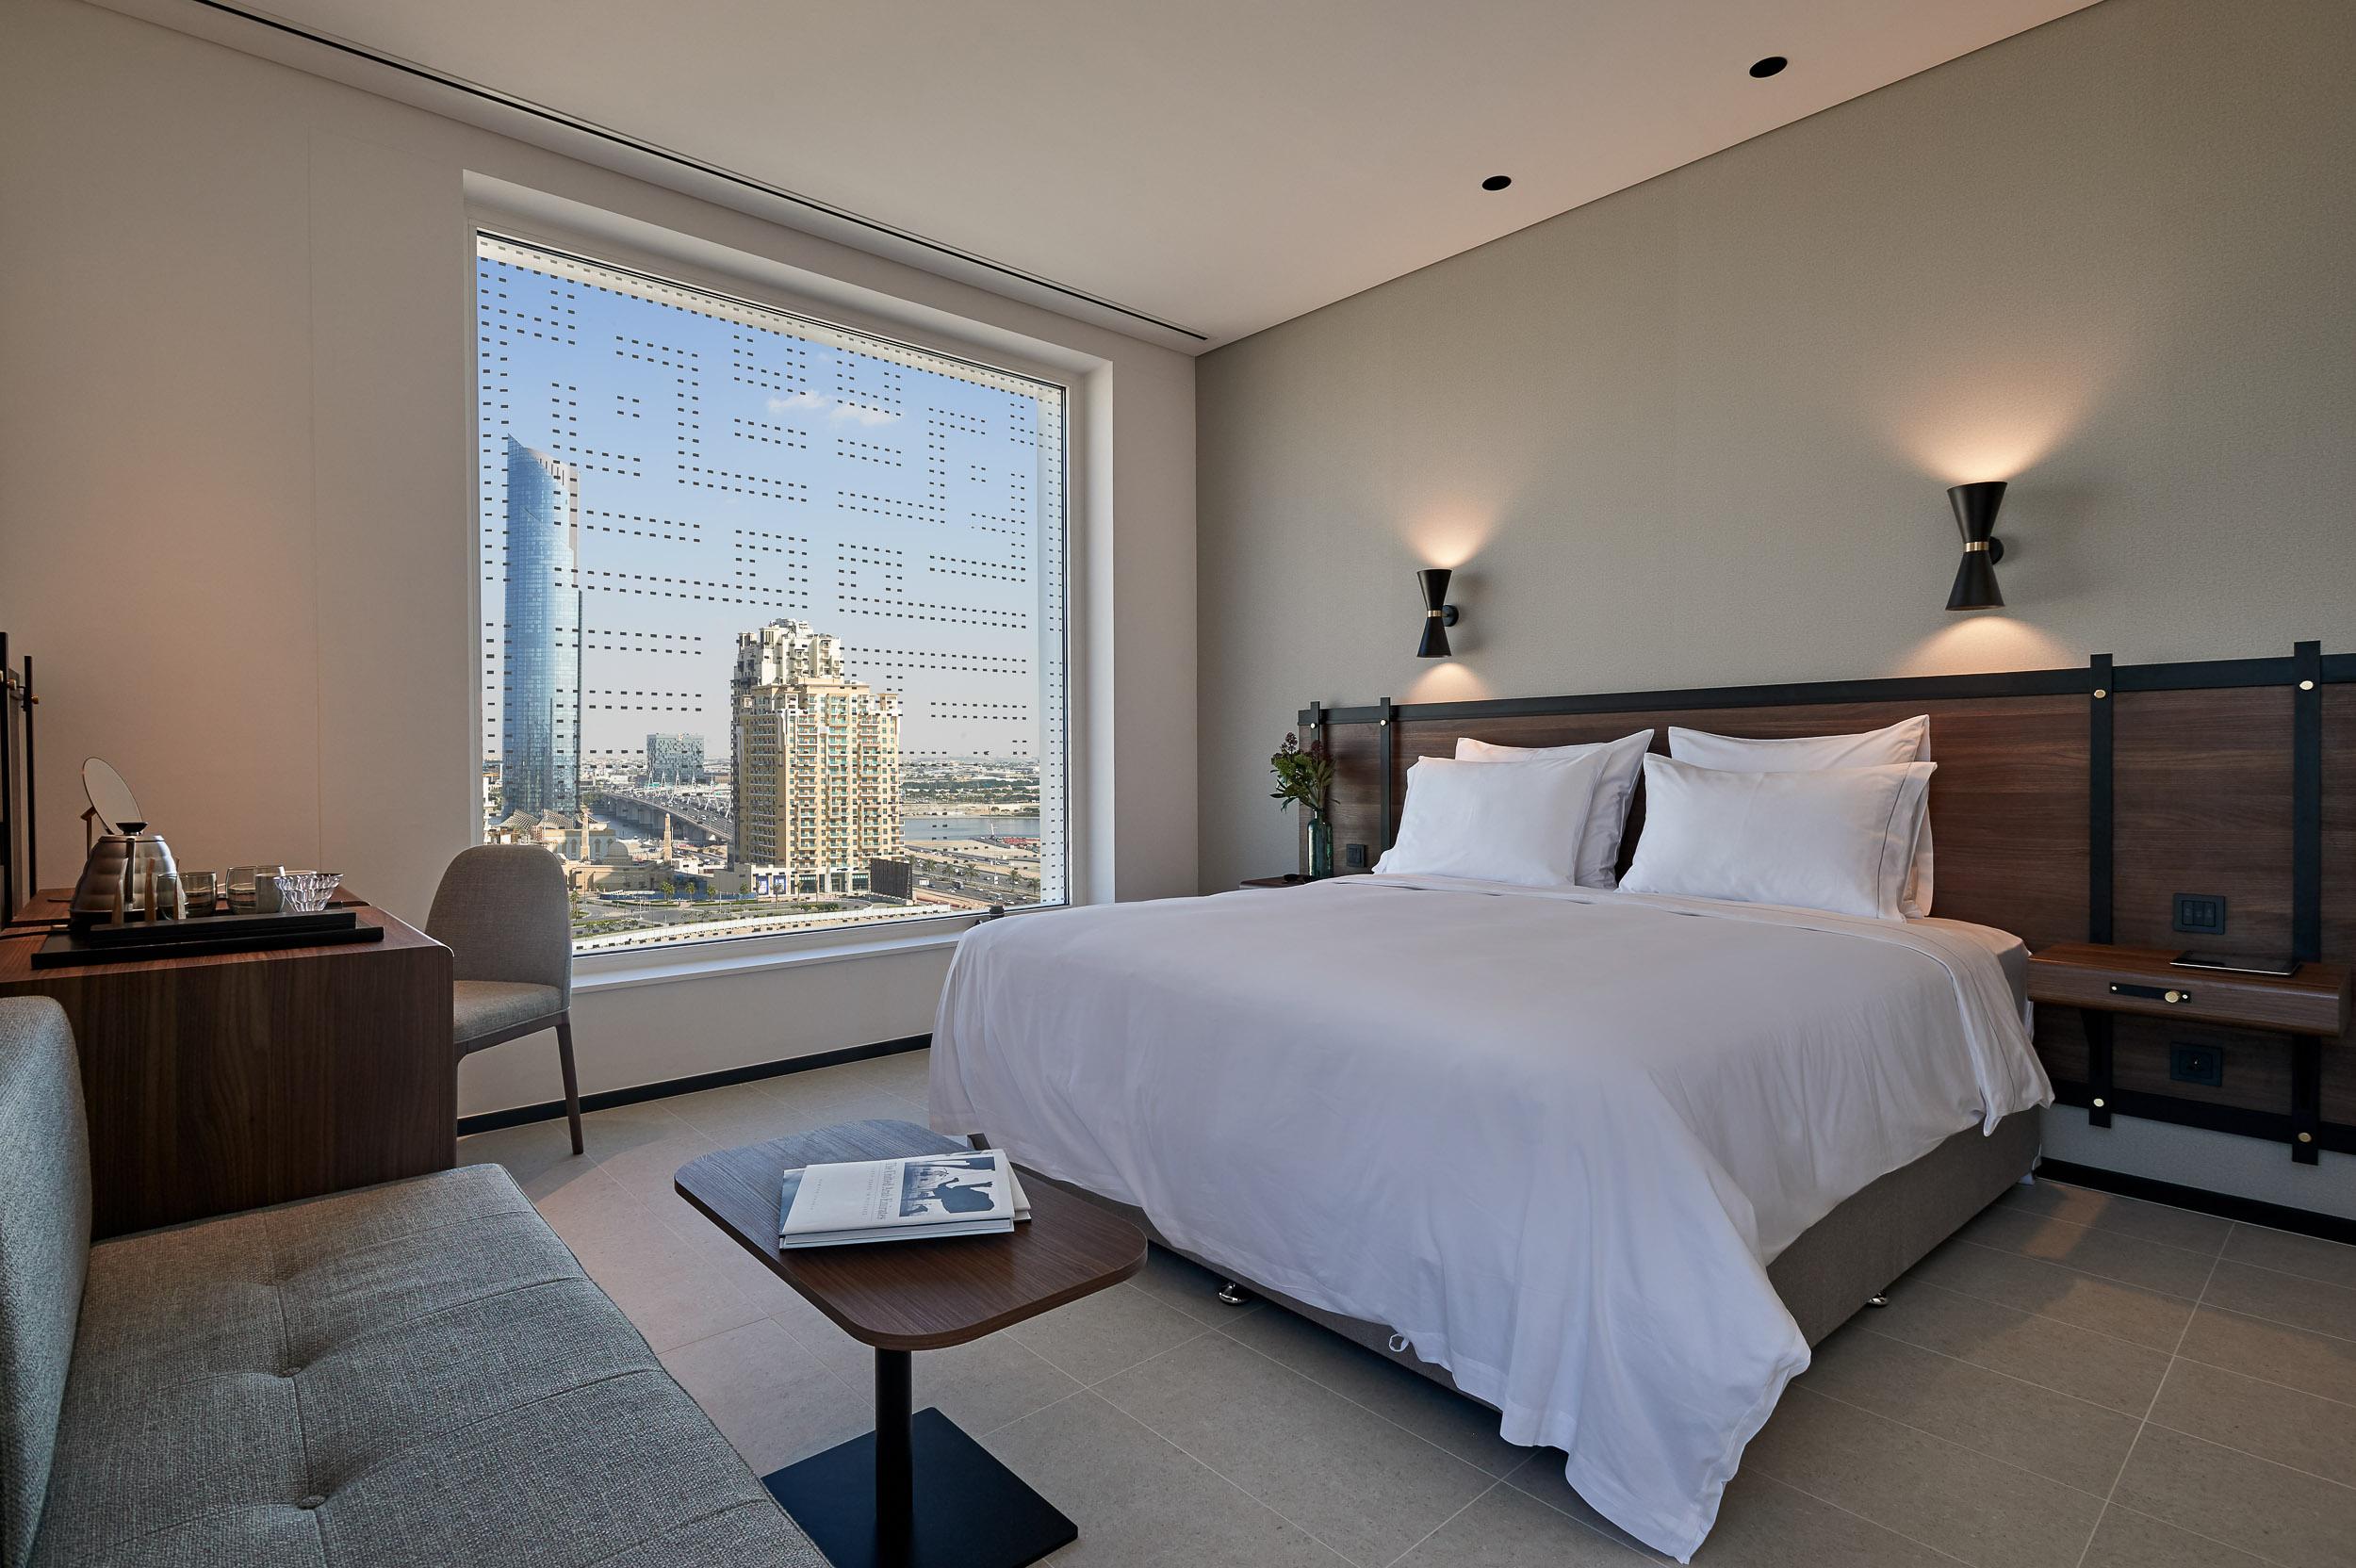 Form Hotel_Rooms 10.JPG